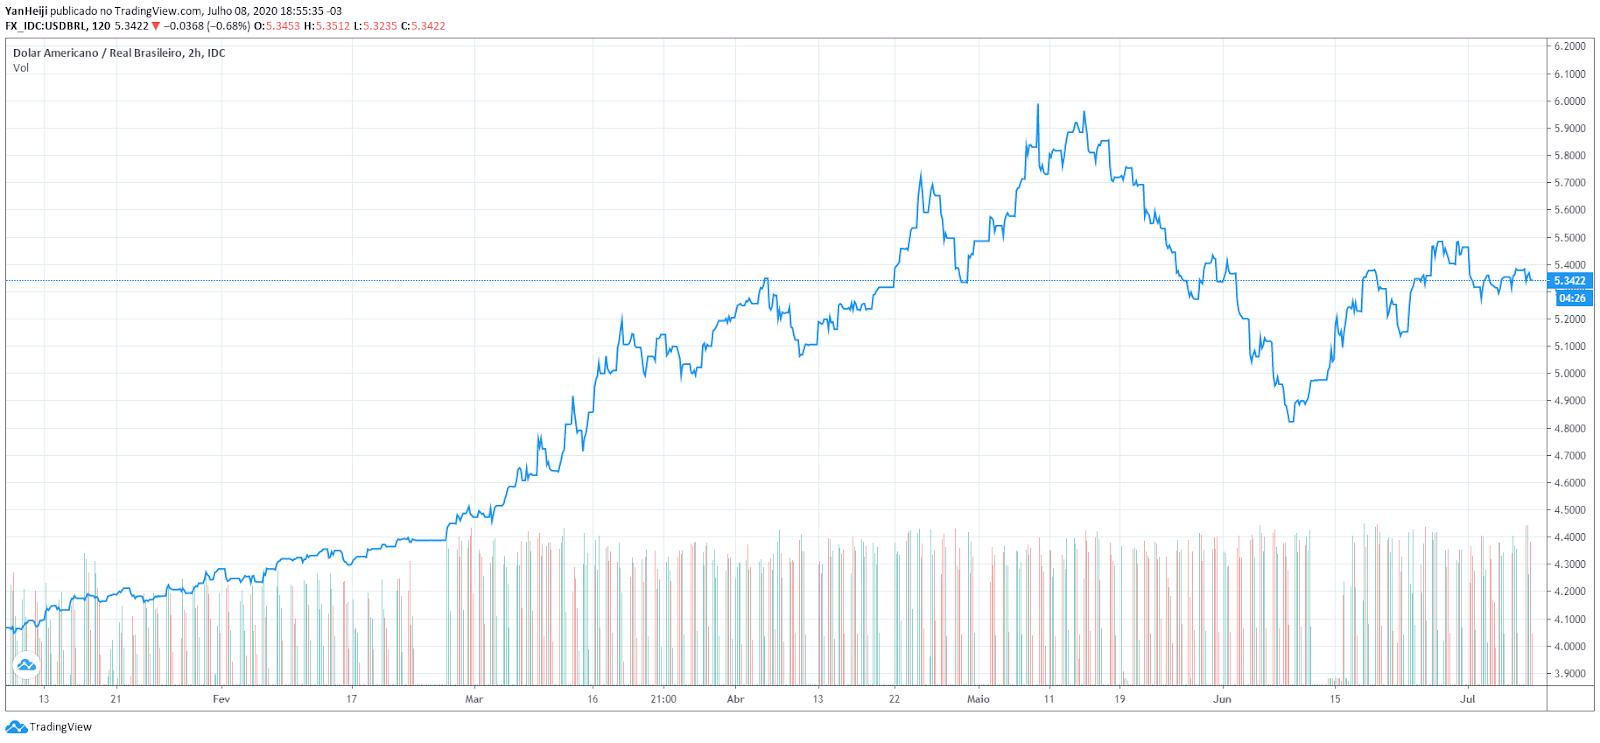 Dólar (USD) para Real (BRL). Fonte: TradingView